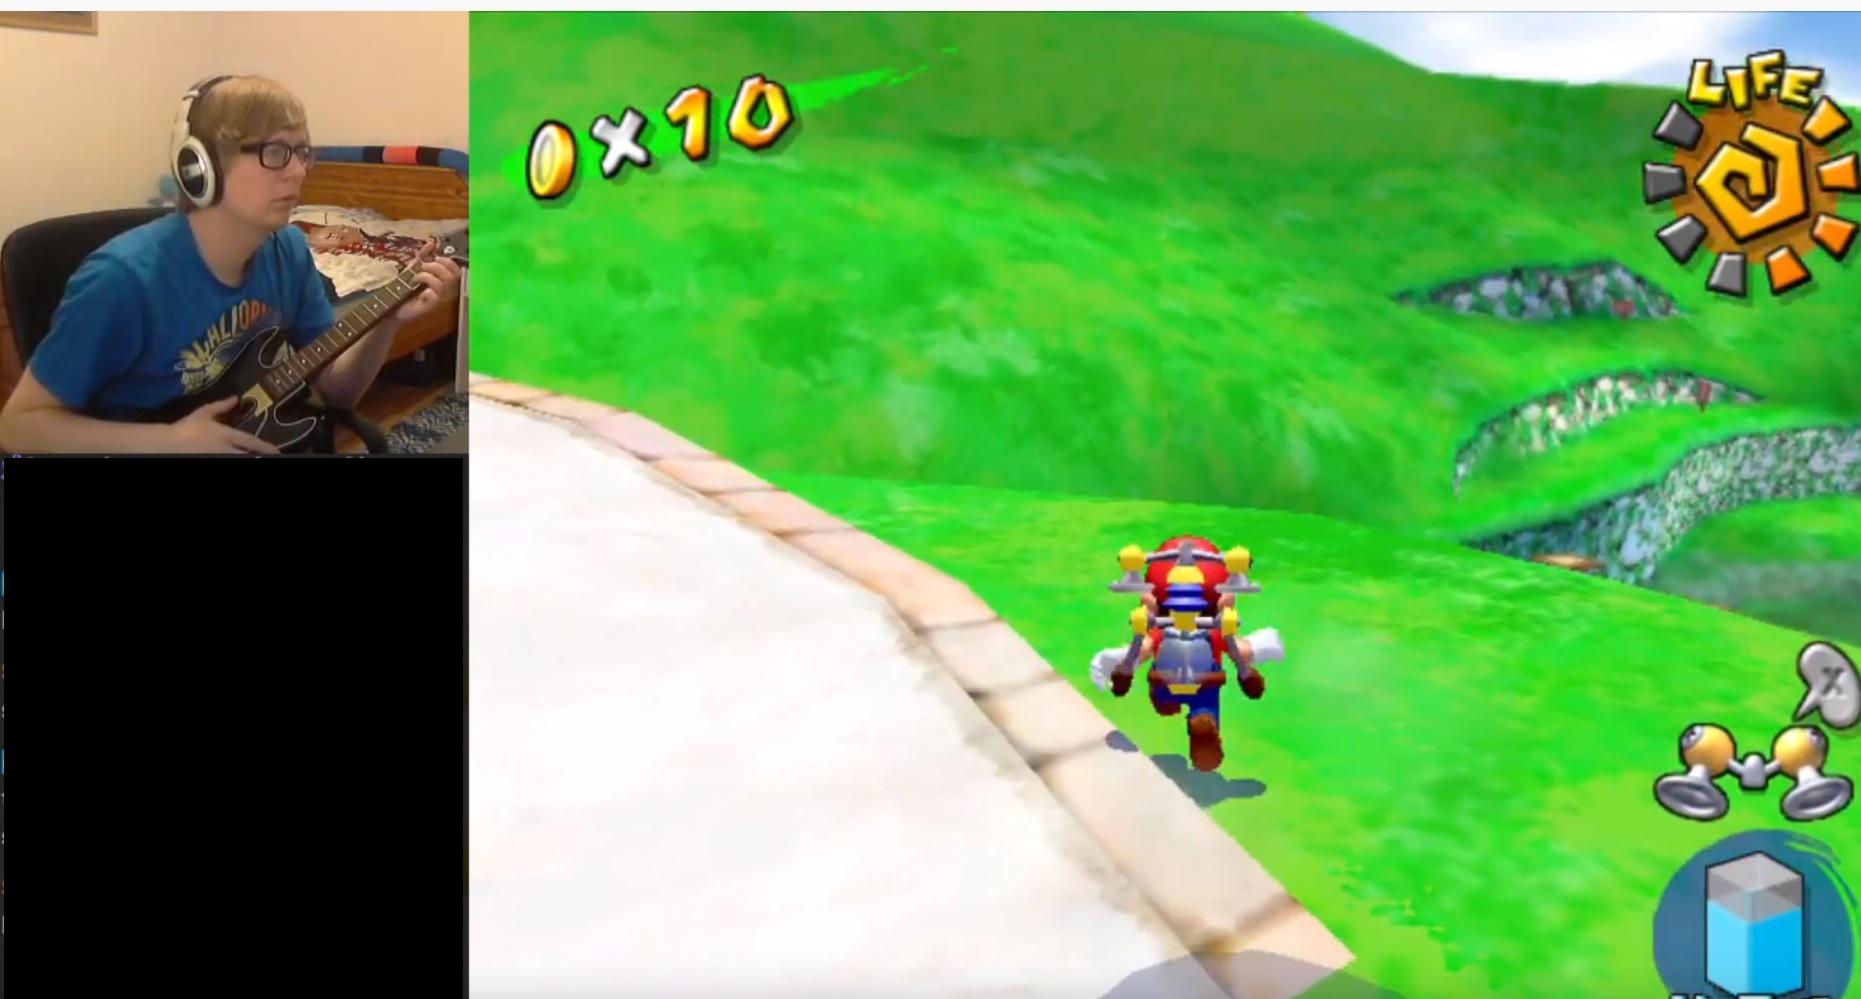 A Mario Sunshine speedrun with a guitar controller? Sure why not screenshot